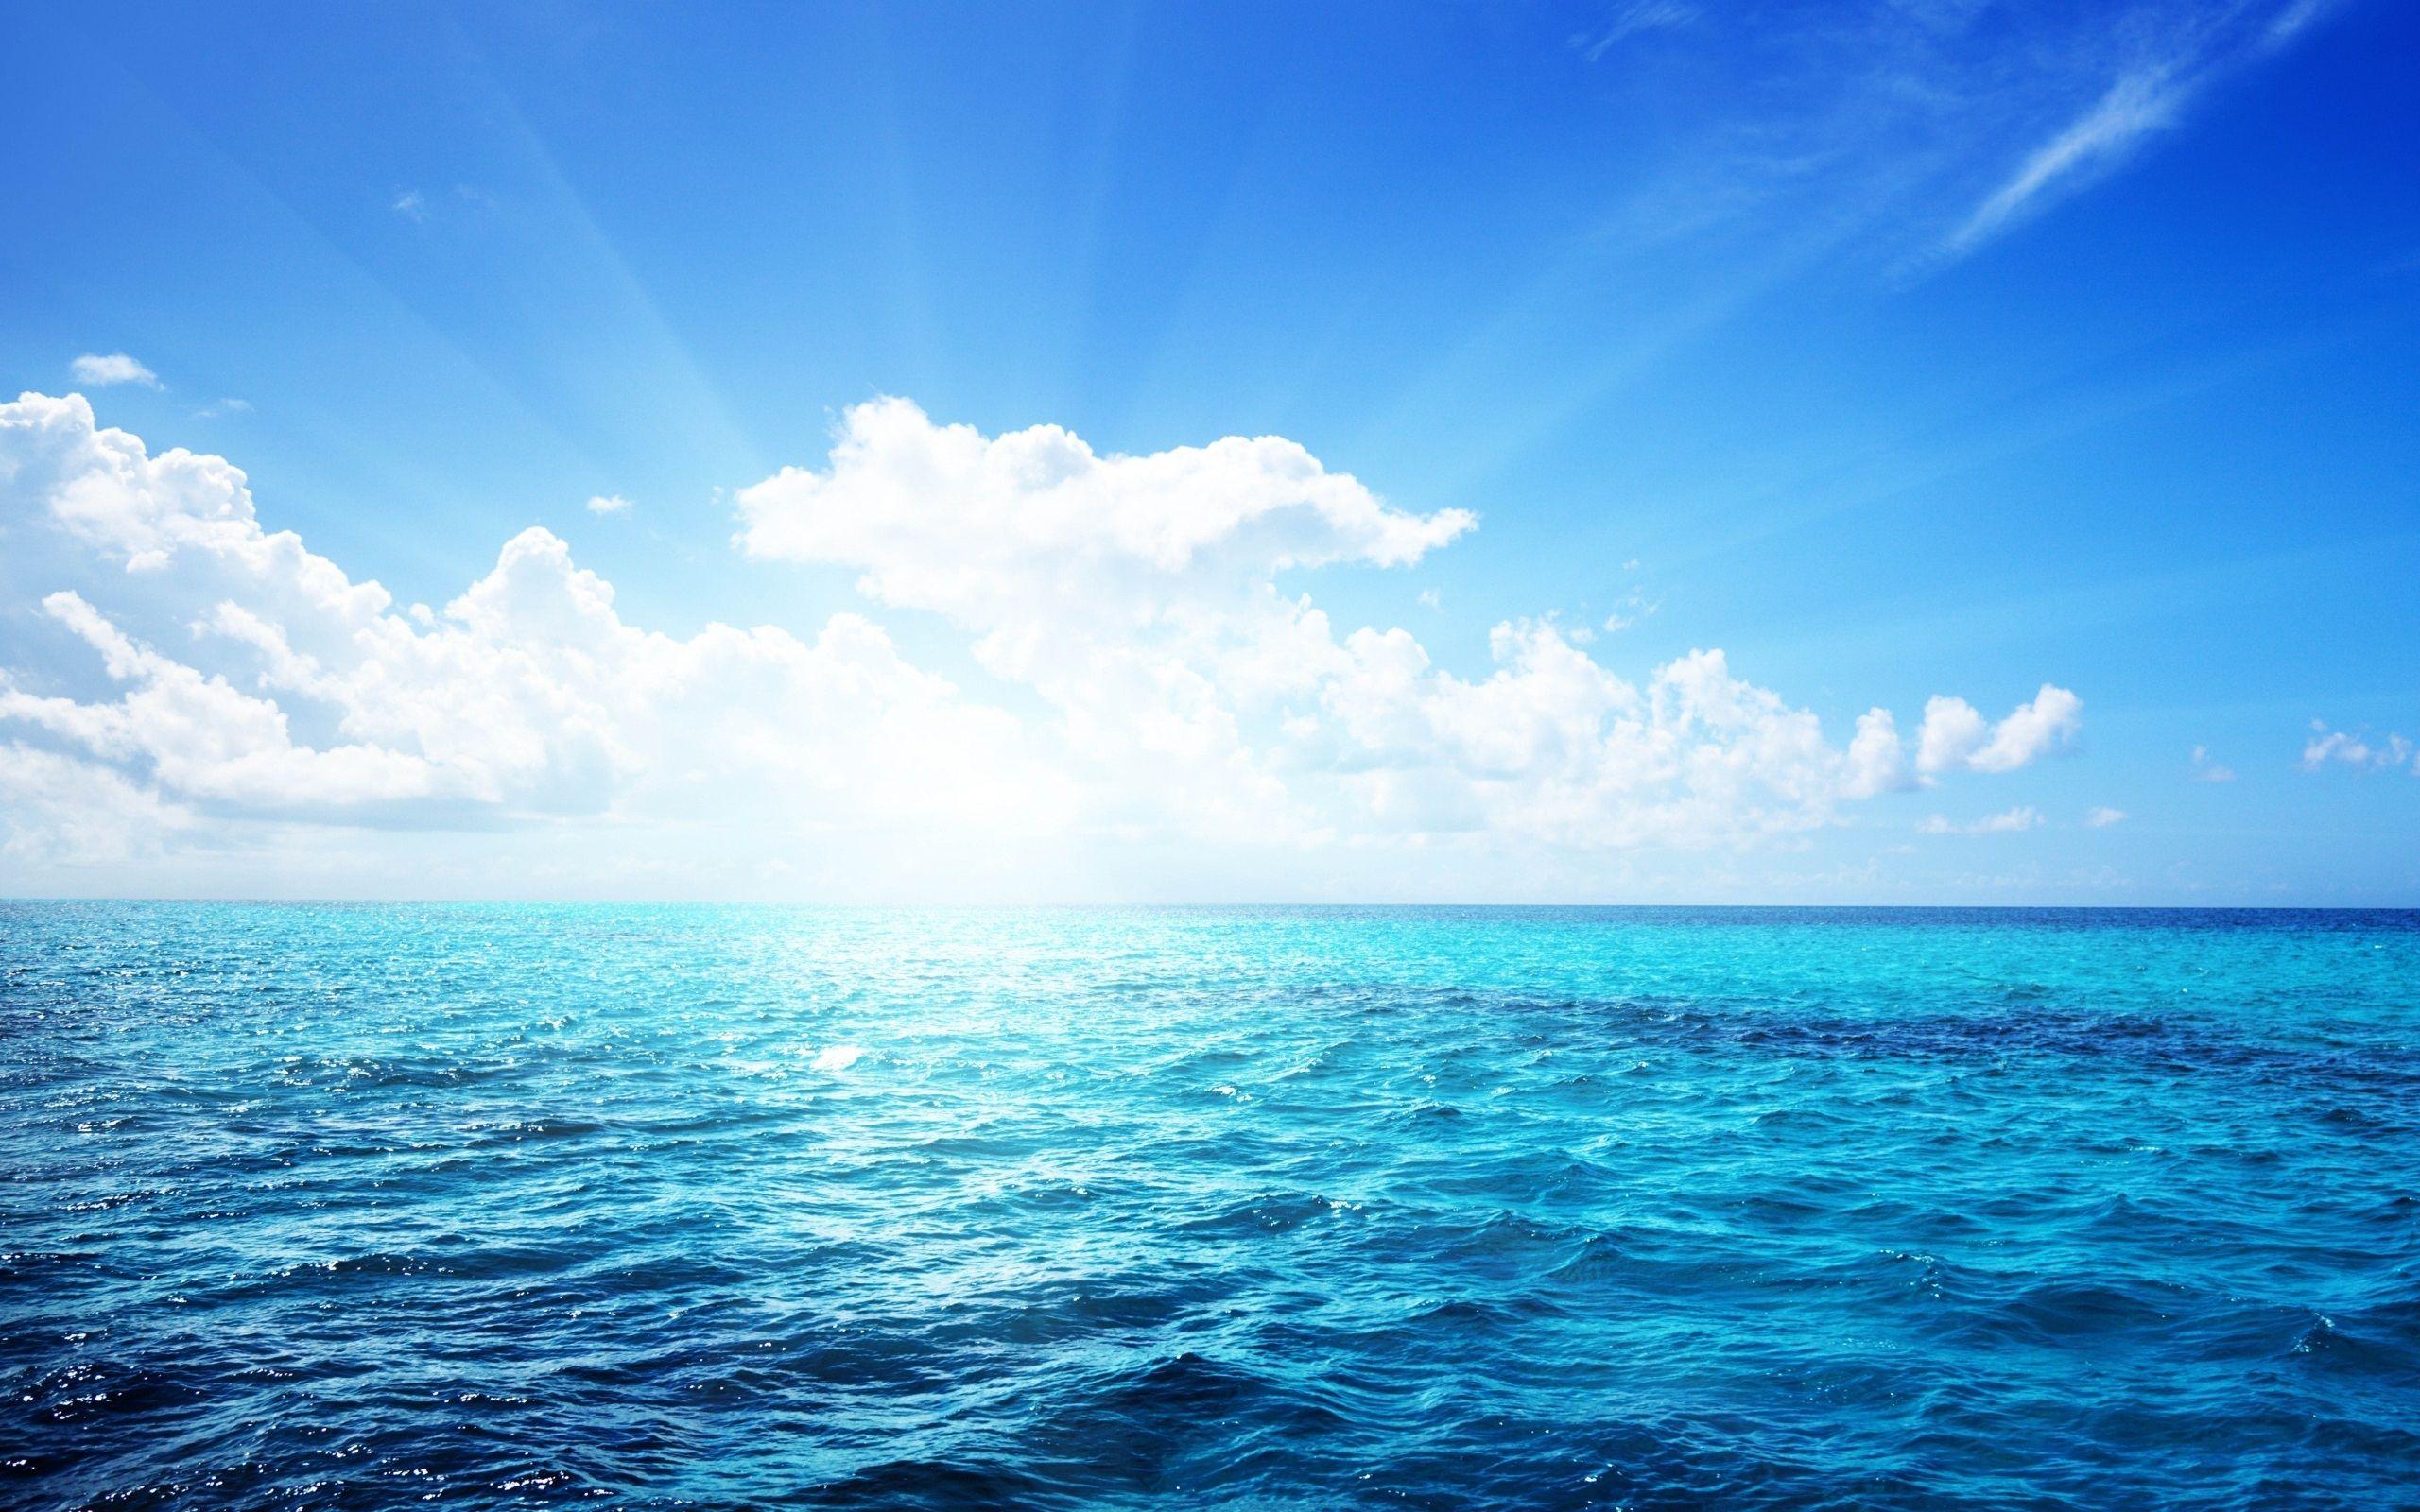 blue sea sky clouds | photograph | pinterest | cloud